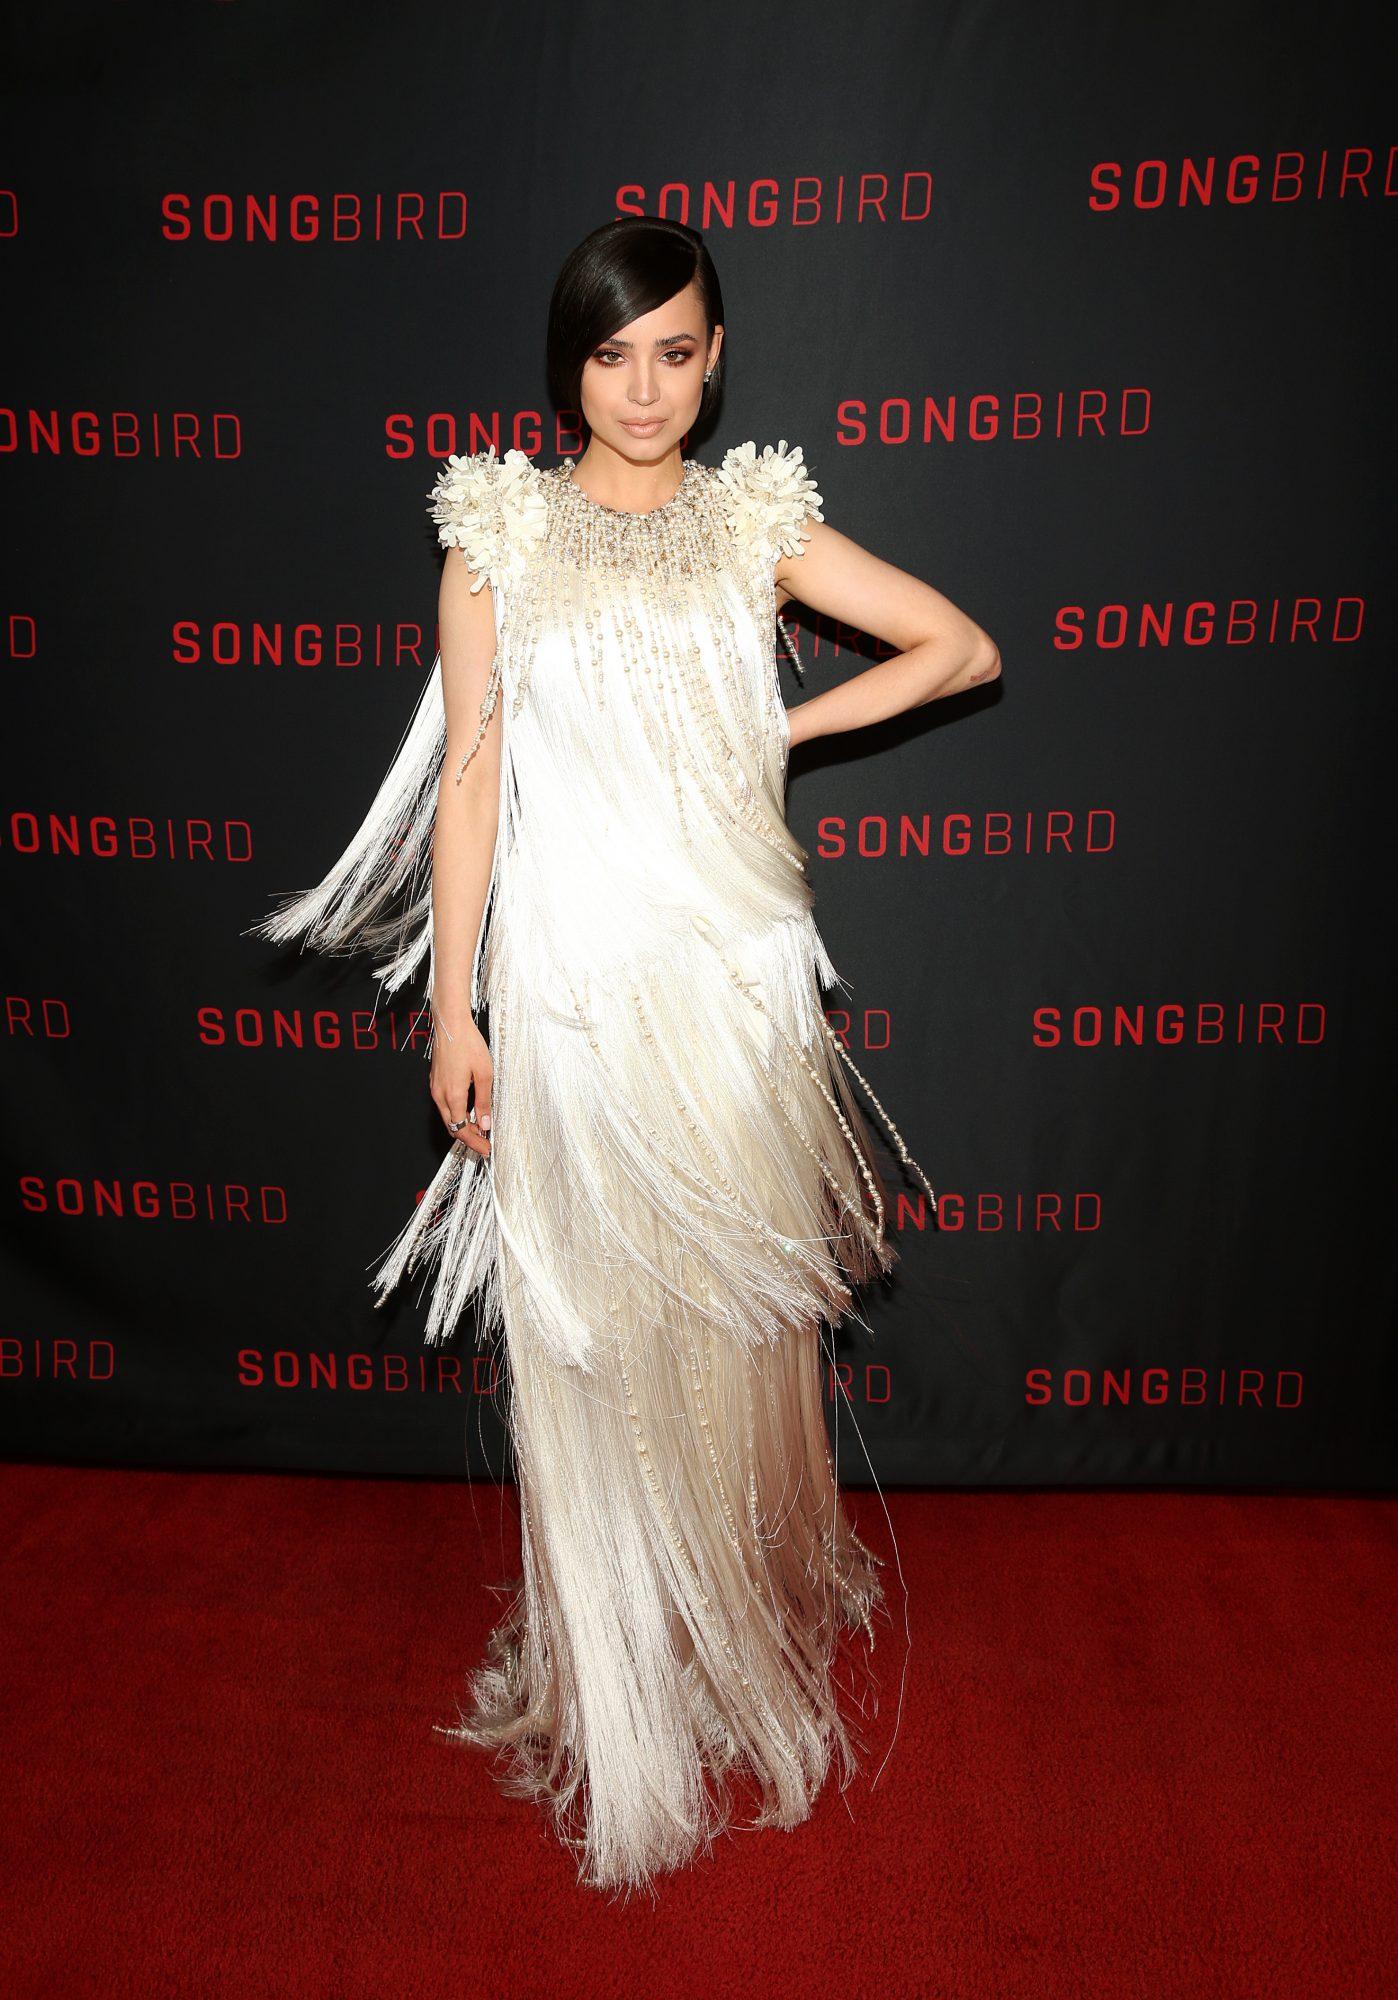 Sofia Carson estreno Songbird